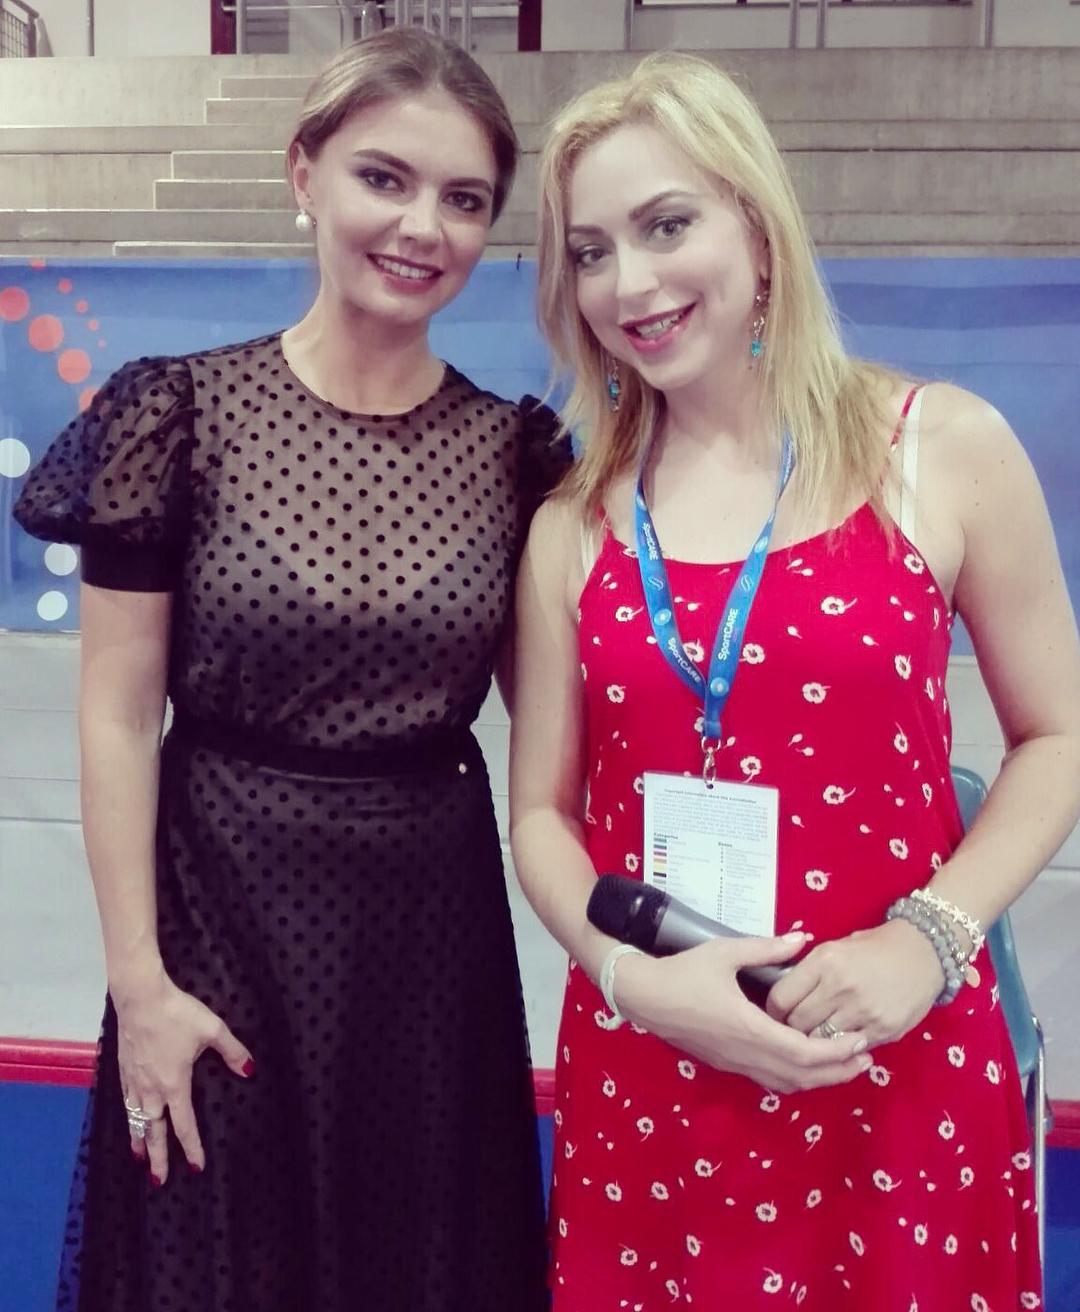 With the QUEEN of rhythmic gymnastics Alina Kabaeva #worldschampionship #pesaro2017 #rhithmicgymnastic #alinakabaeva #russia #russiangymnast #italiantelevision #interview #russiangymnastics #goodvibes #queen #olympicchampion #motivational